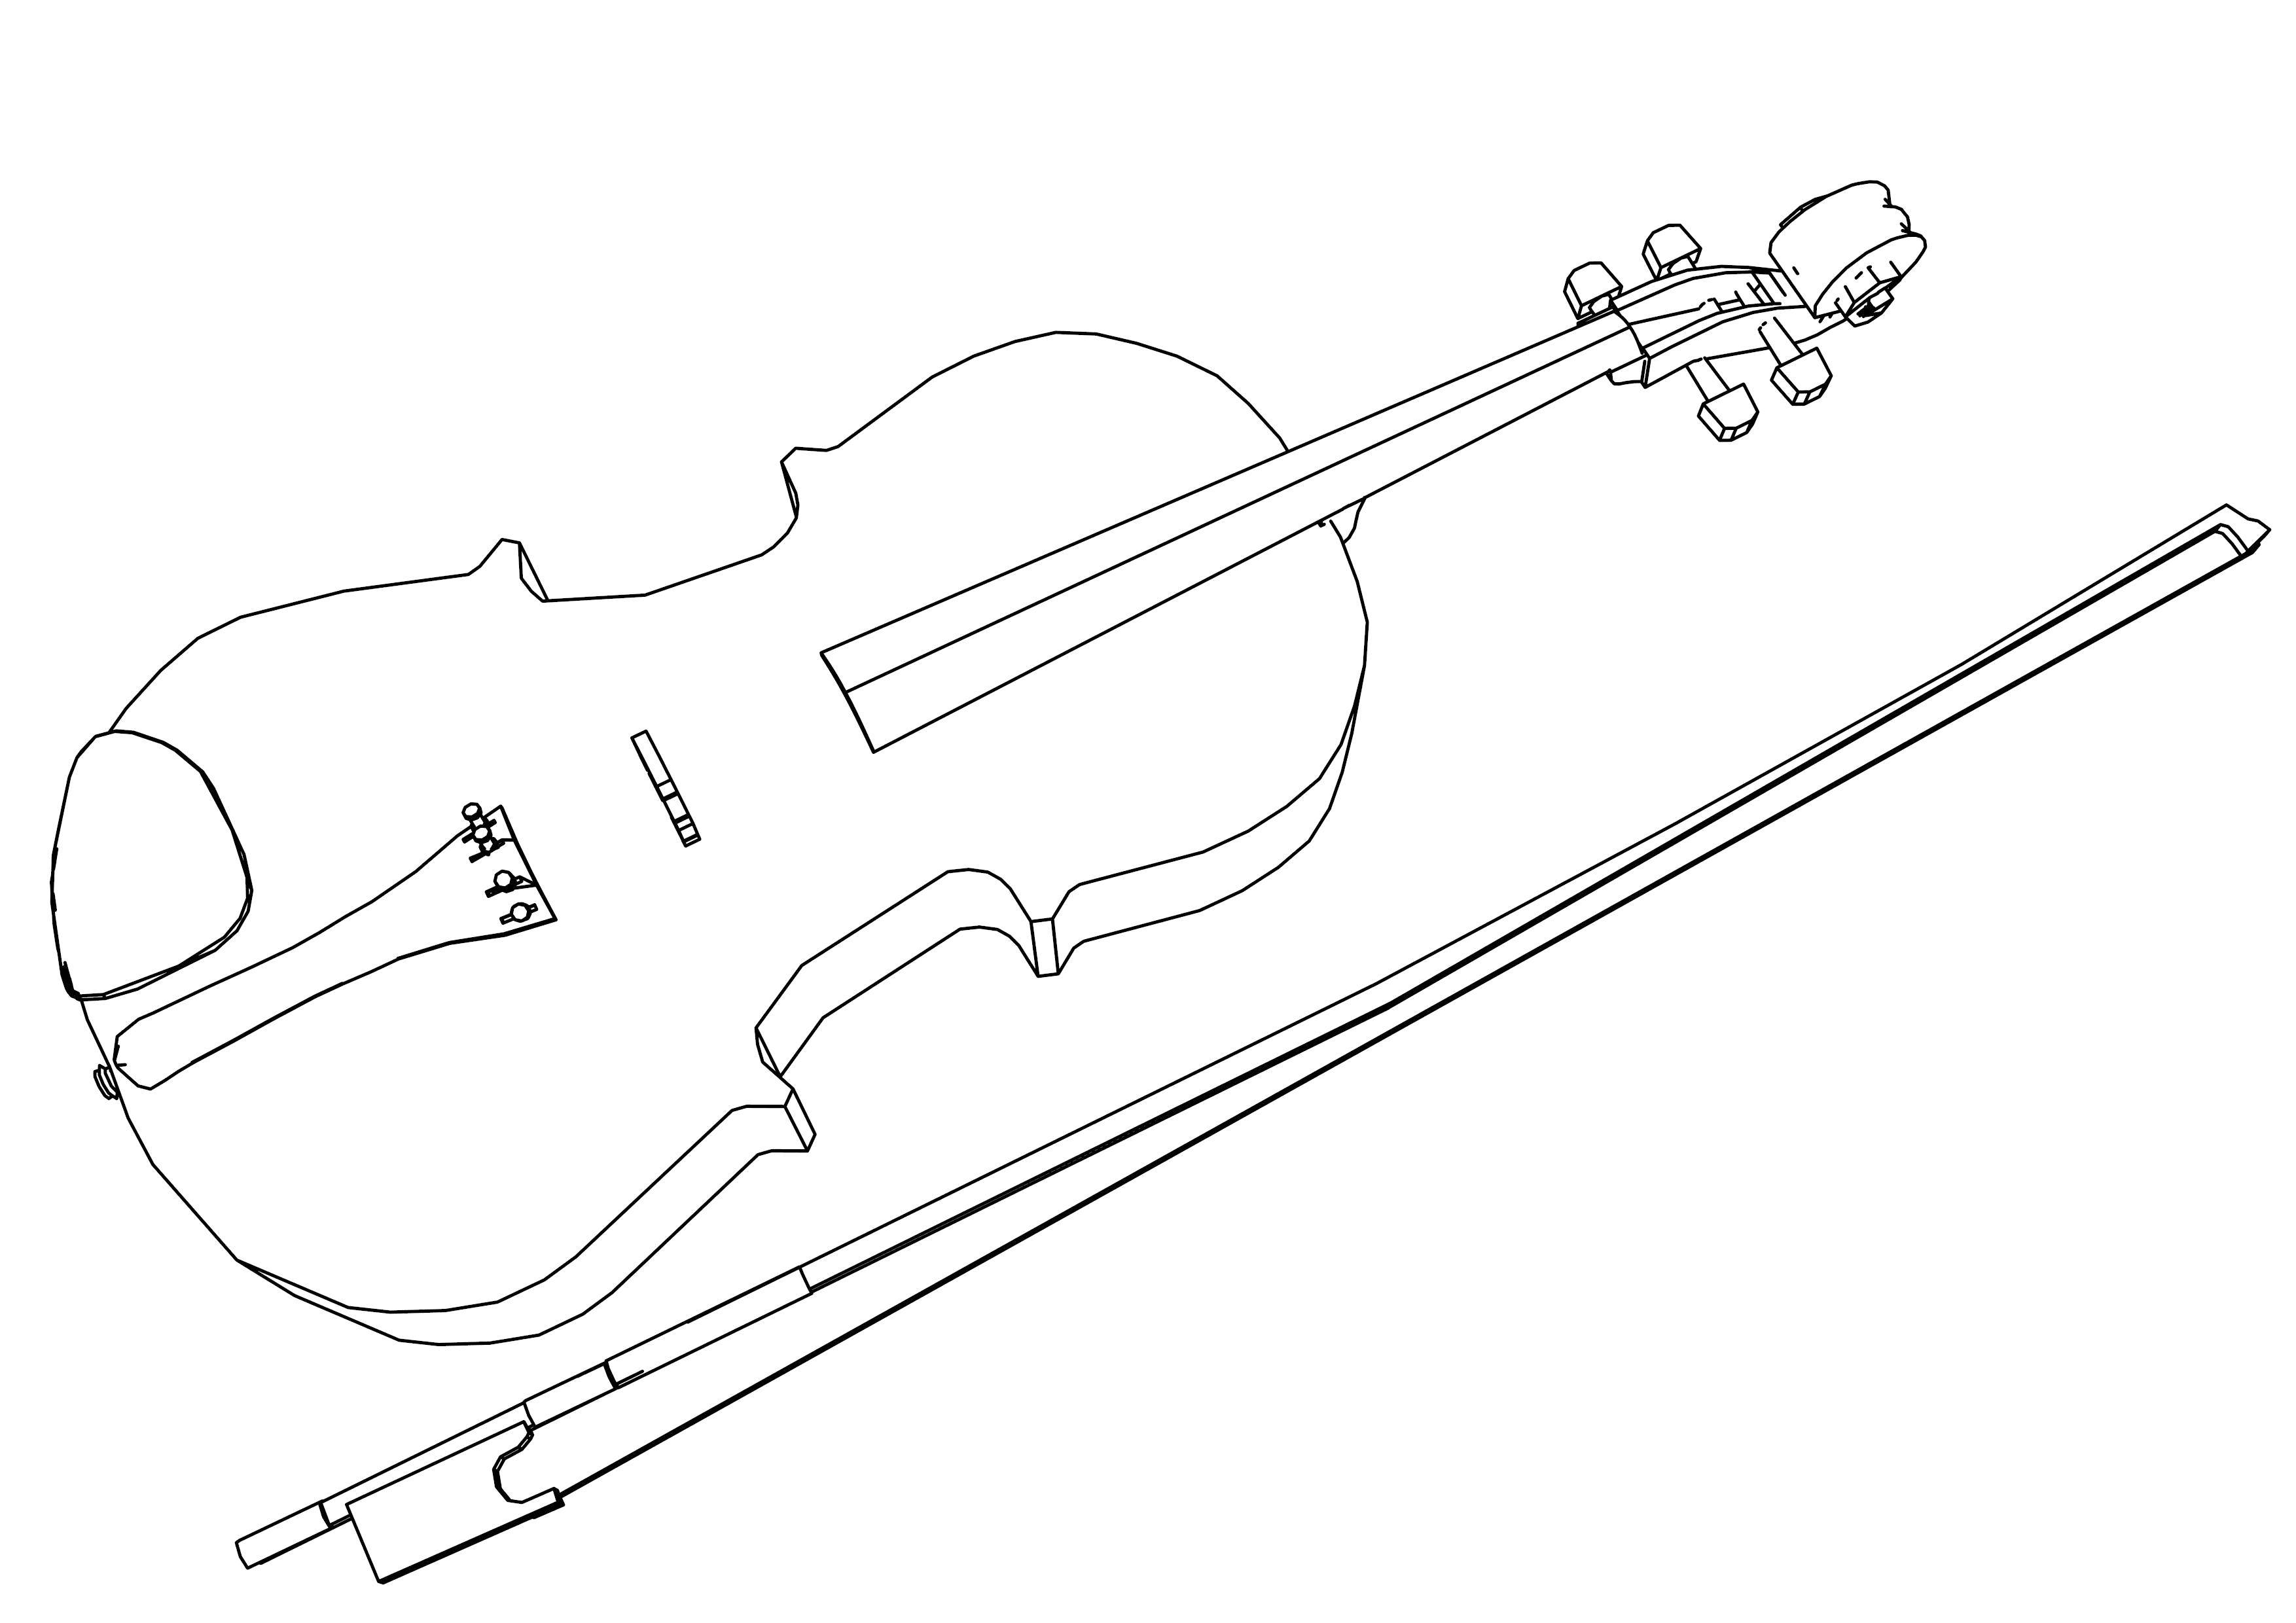 Coloring sheet music Download Plane.  Print ,coloring,